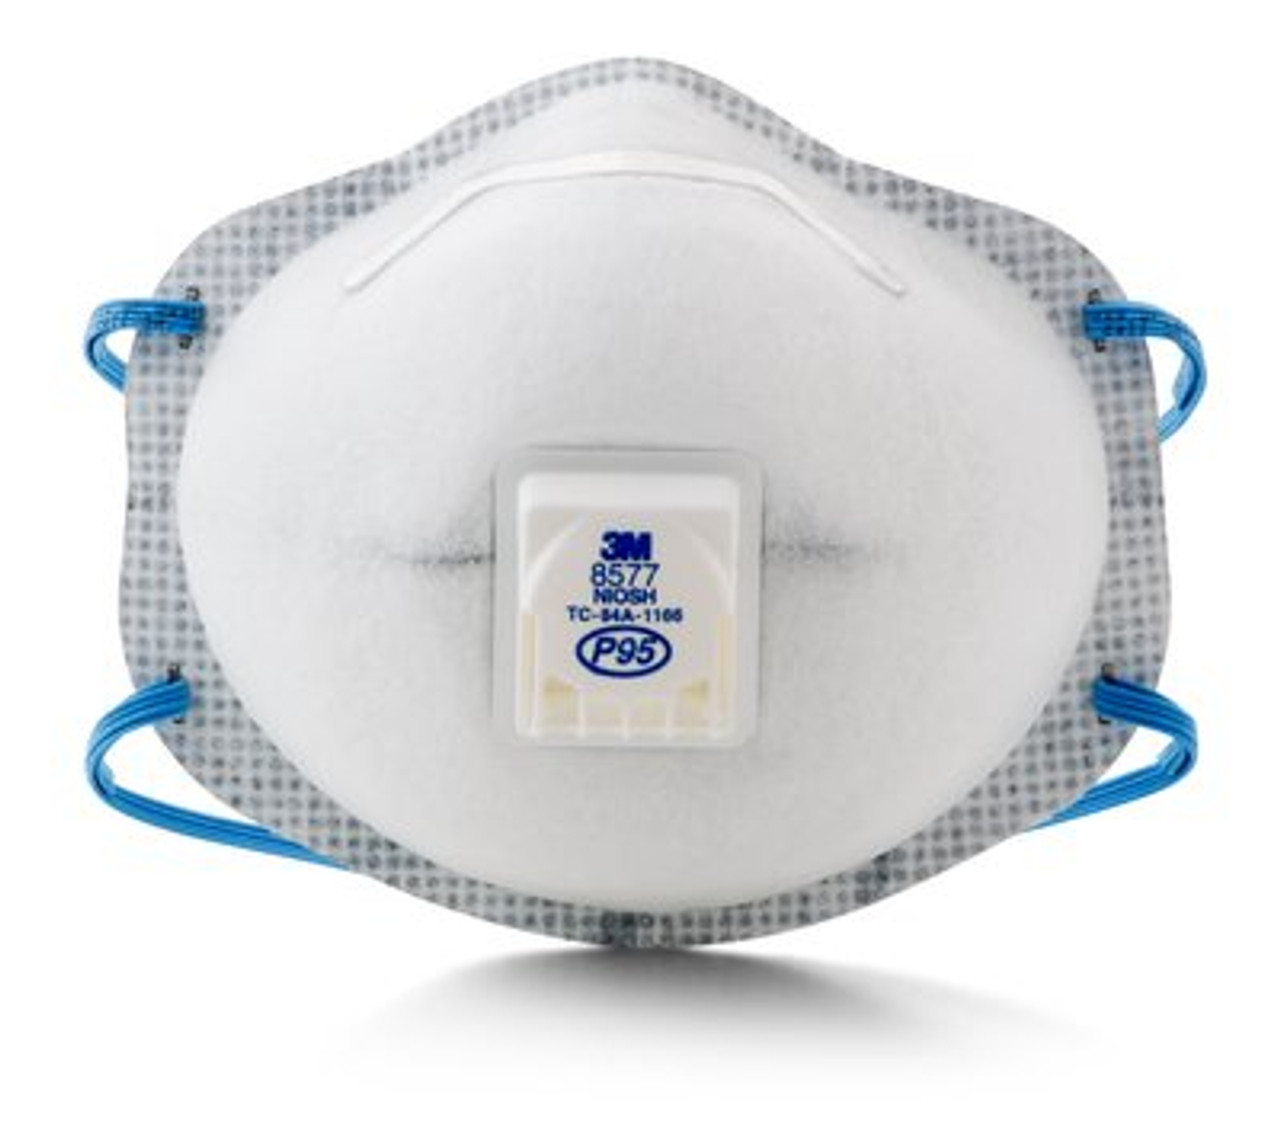 3m organic vapor mask